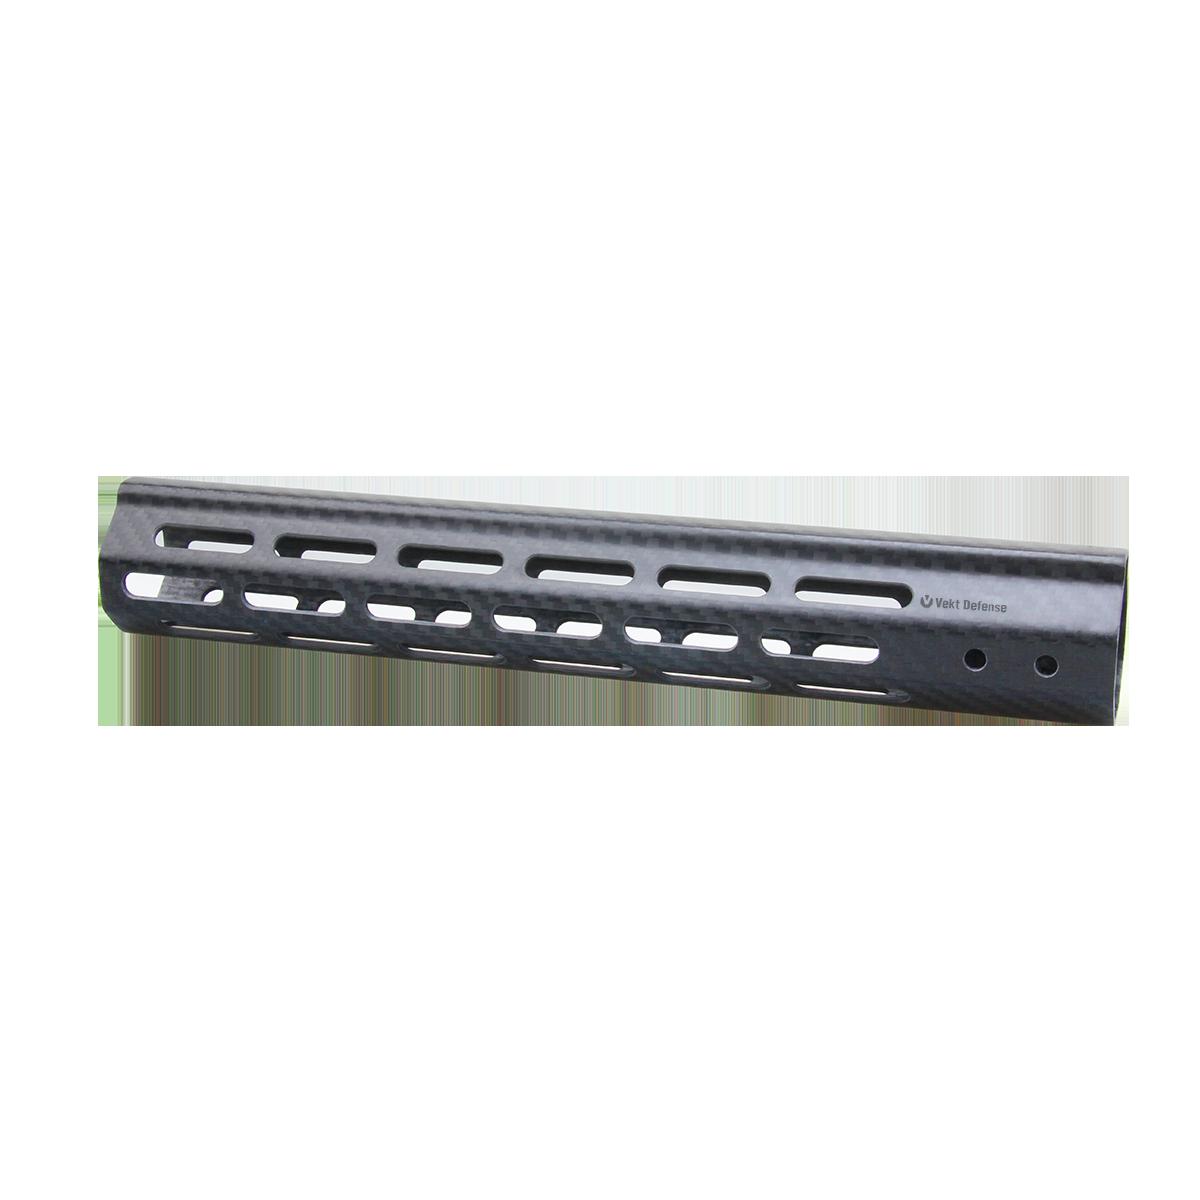 "Vector Optics Vekt Defense VDCF-12 Carbon Fiber 12"" Slim Handguard Rail Mount"